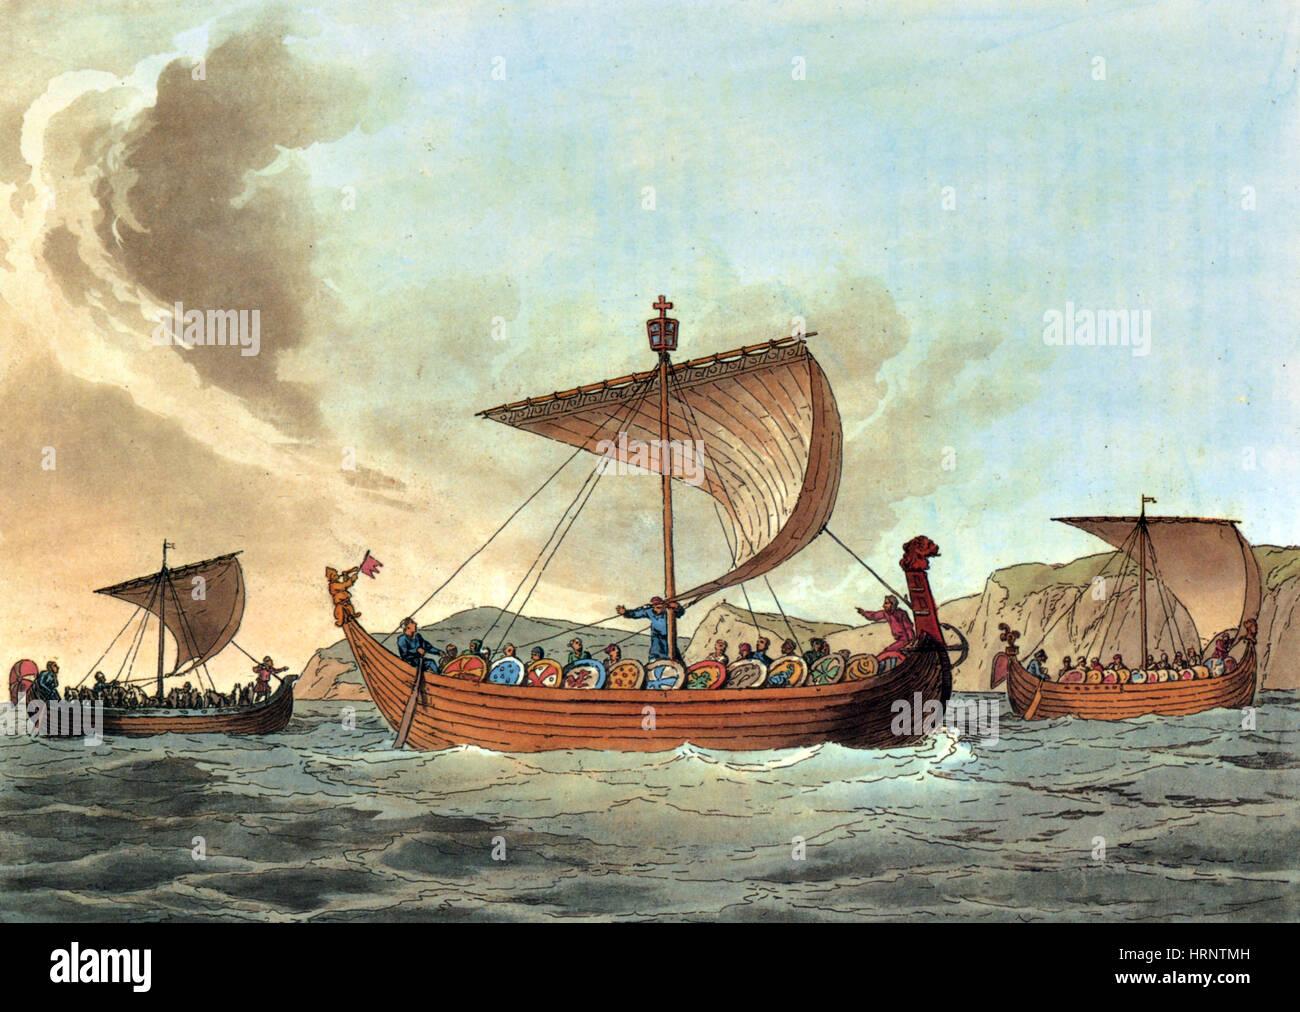 Ships of William the Conqueror - Stock Image